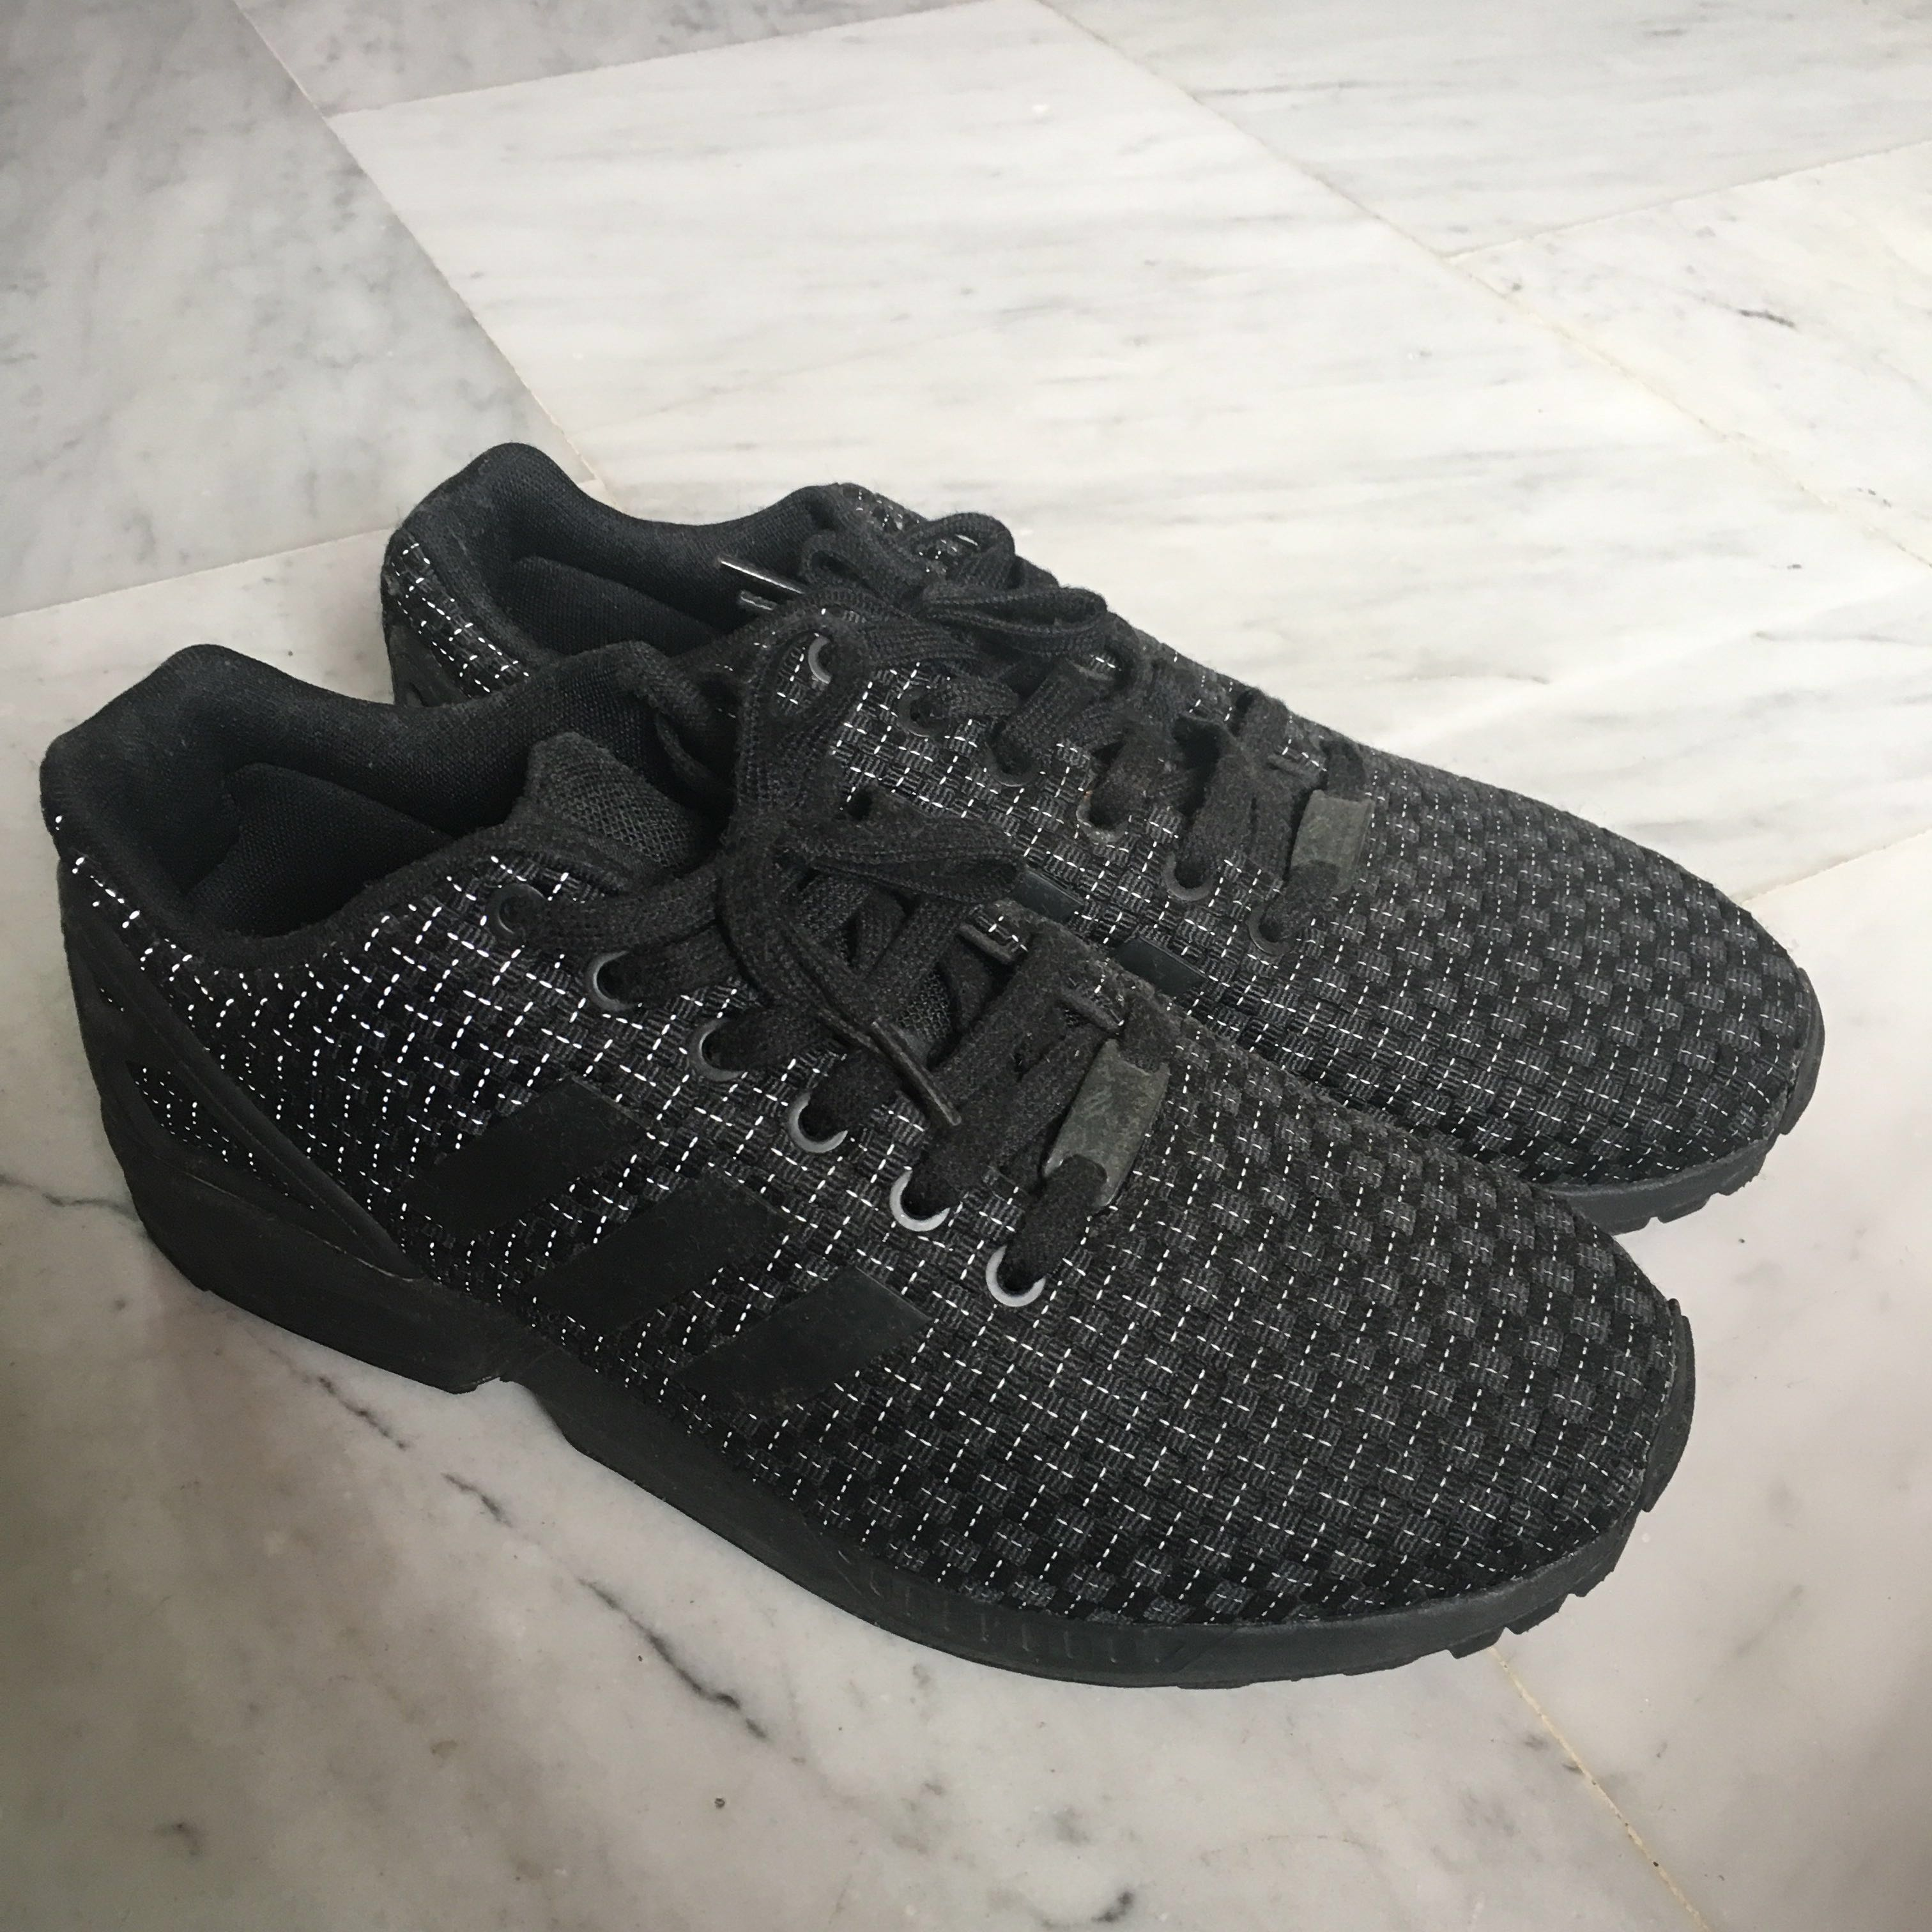 best website ea4da fe299 Adidas Zx flux Reflective Black